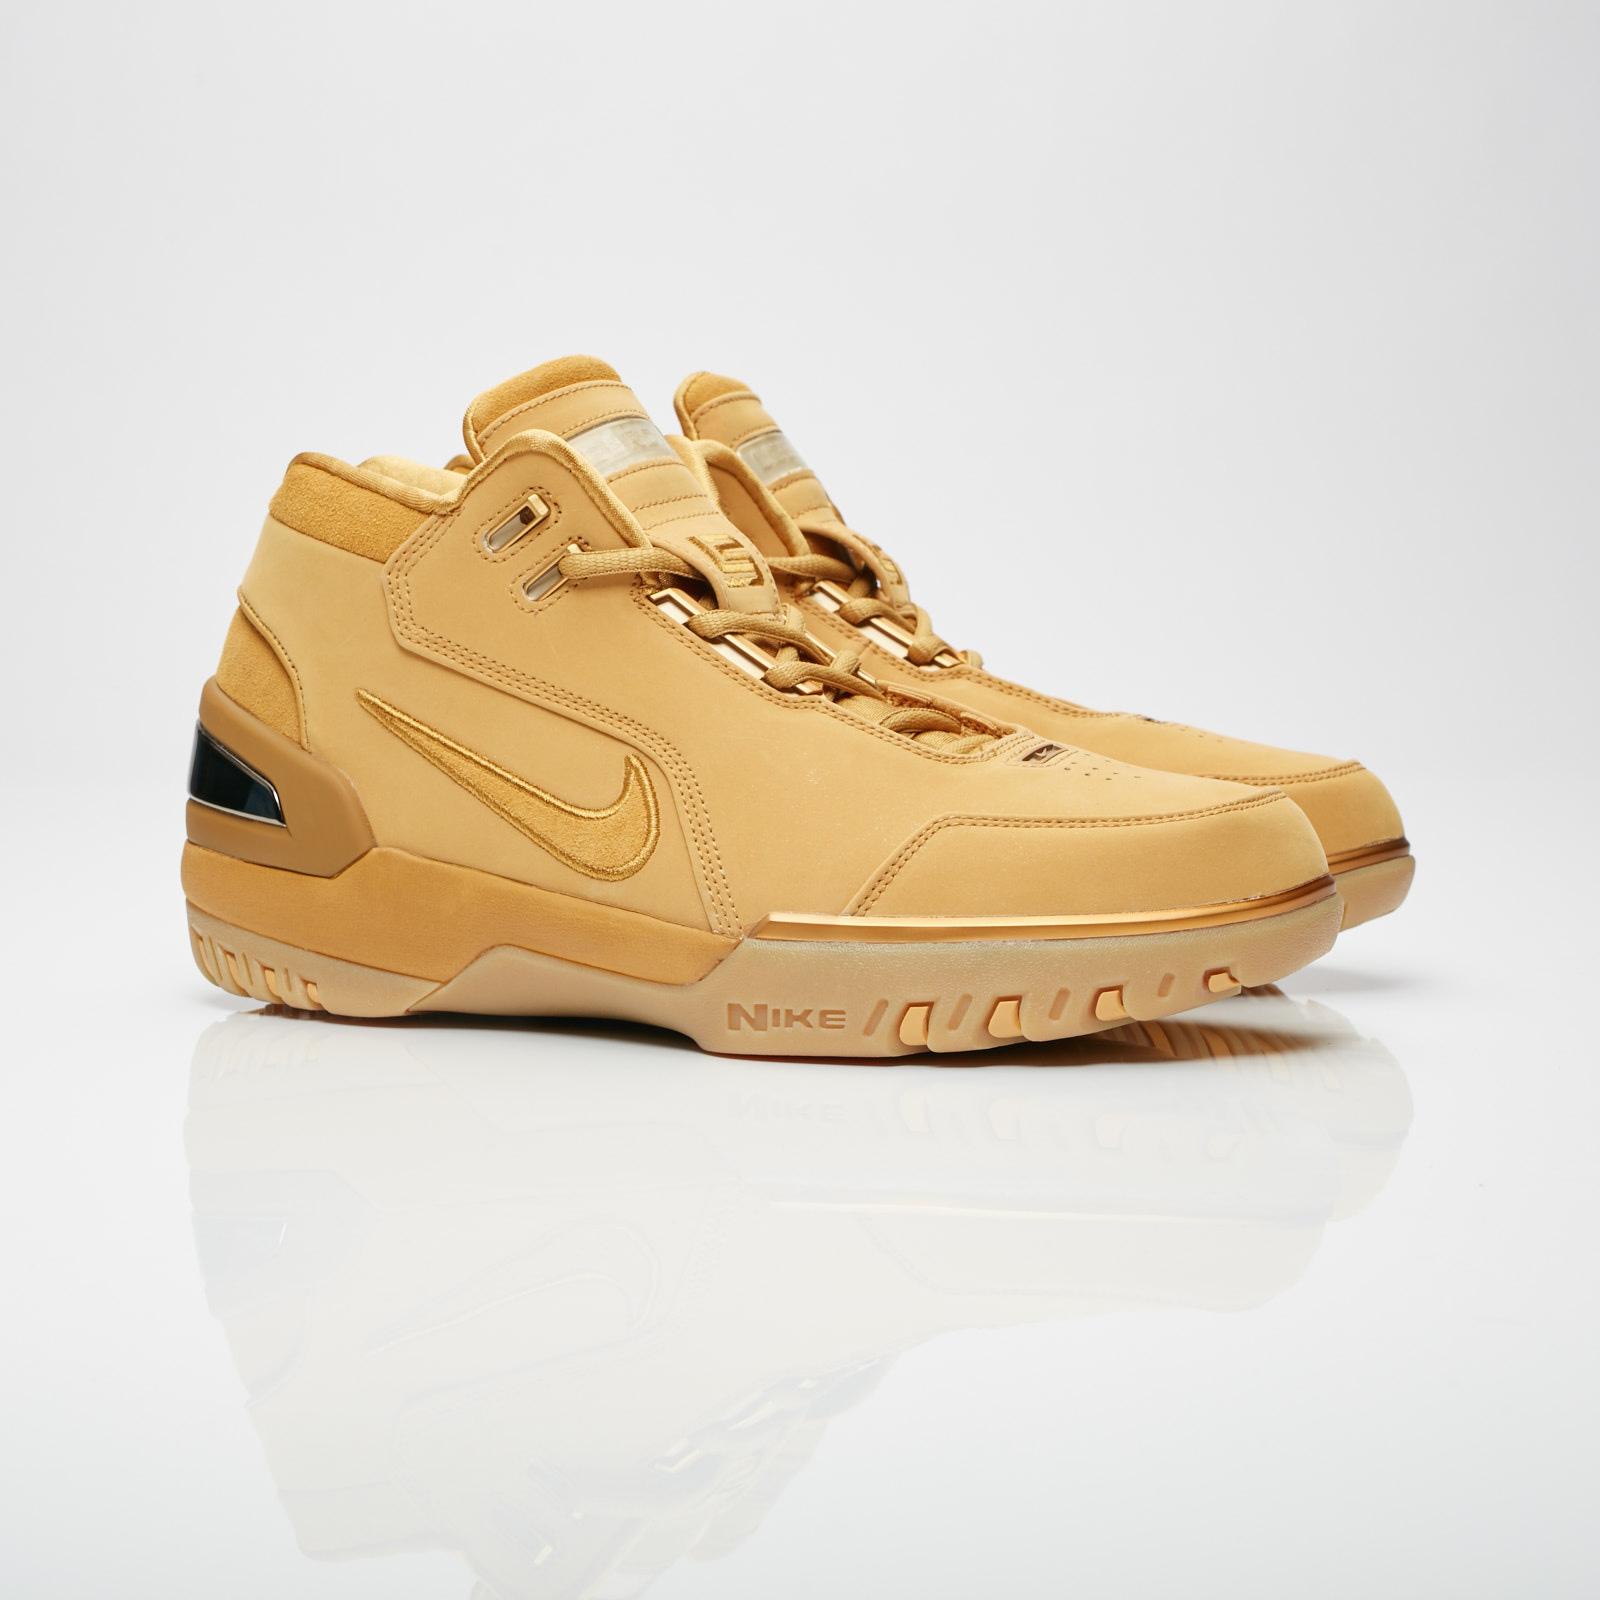 1b64b2fb90a74 Nike Air Zoom Generation ASG QS - Aq0110-700 - Sneakersnstuff ...